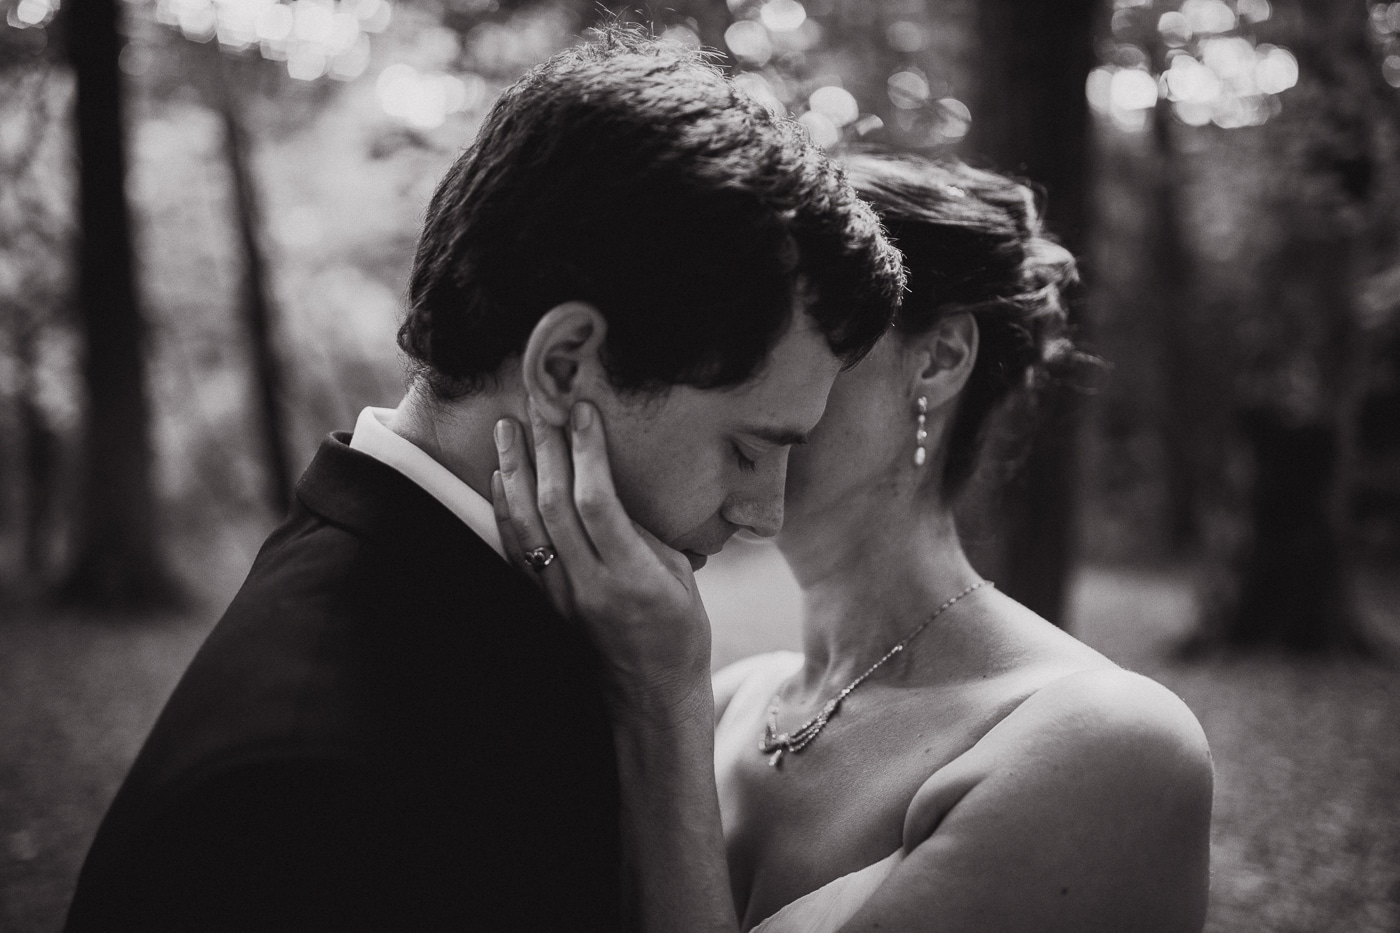 Bride embracing groom by Joshua Wyborn Photographic